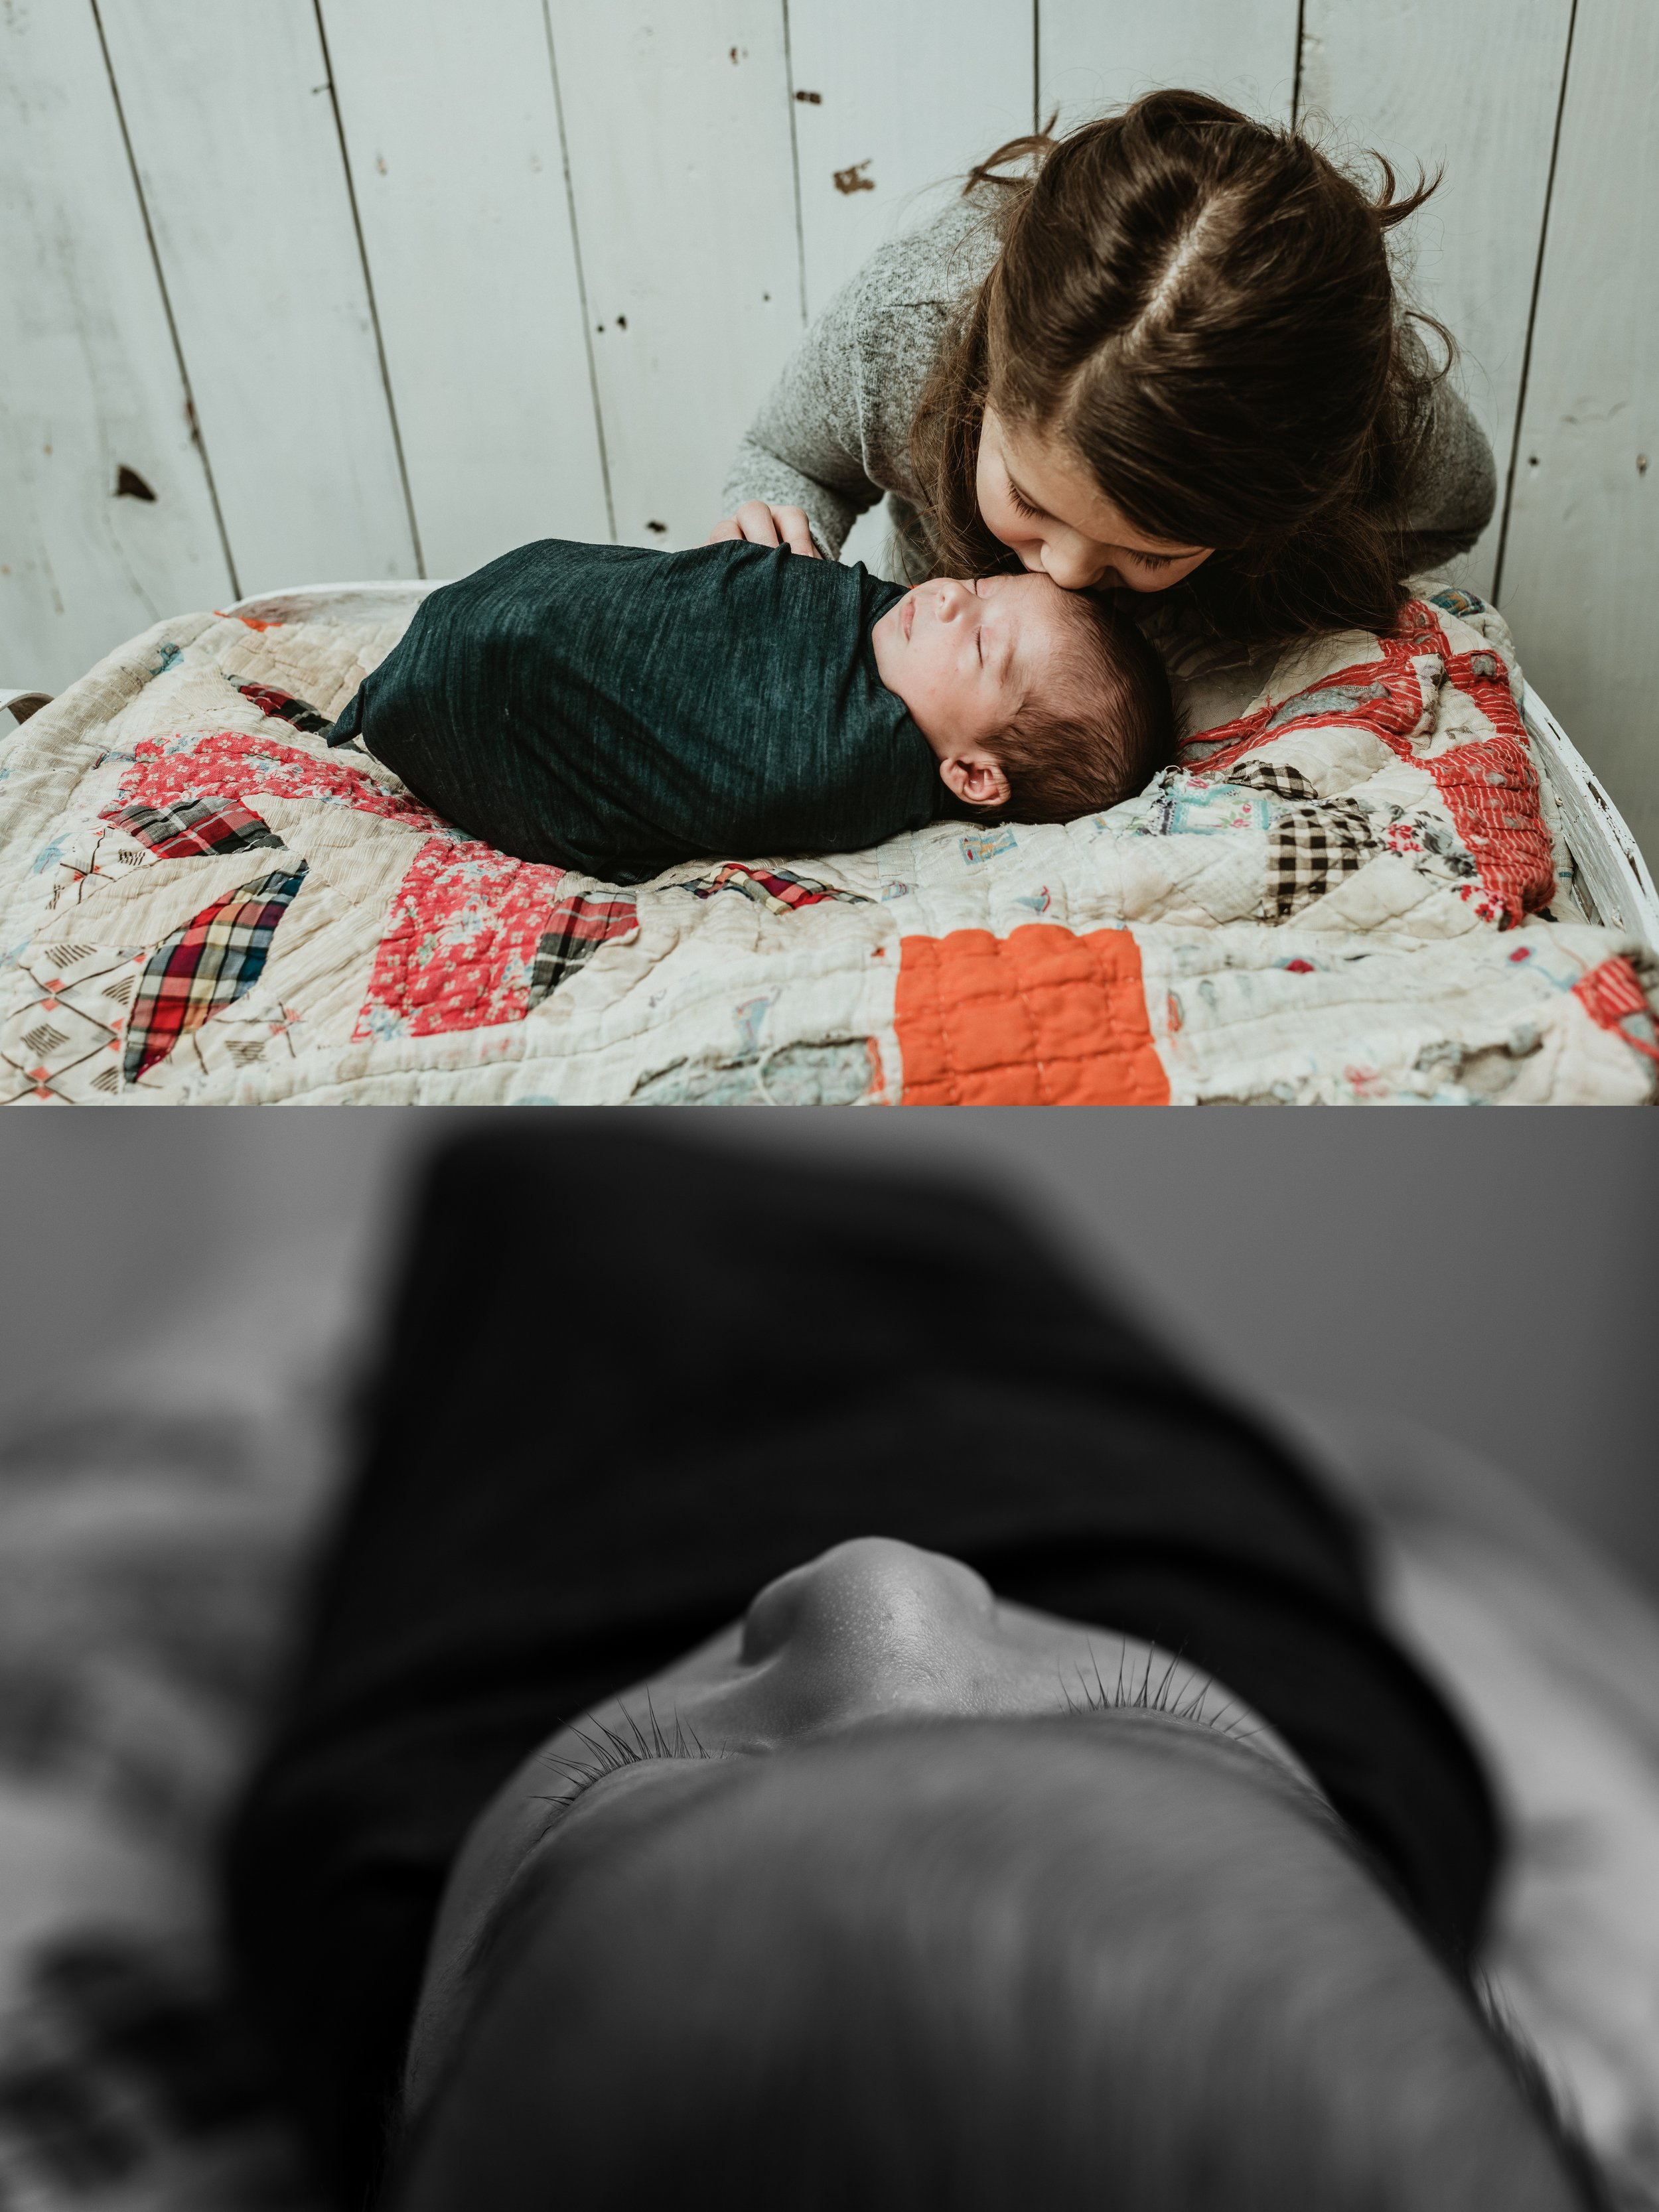 Rustic Newborn Photo Session | Baby Boy | Farmhouse Newborn Studio Session | Sibling Photo | Terry Farms Photography